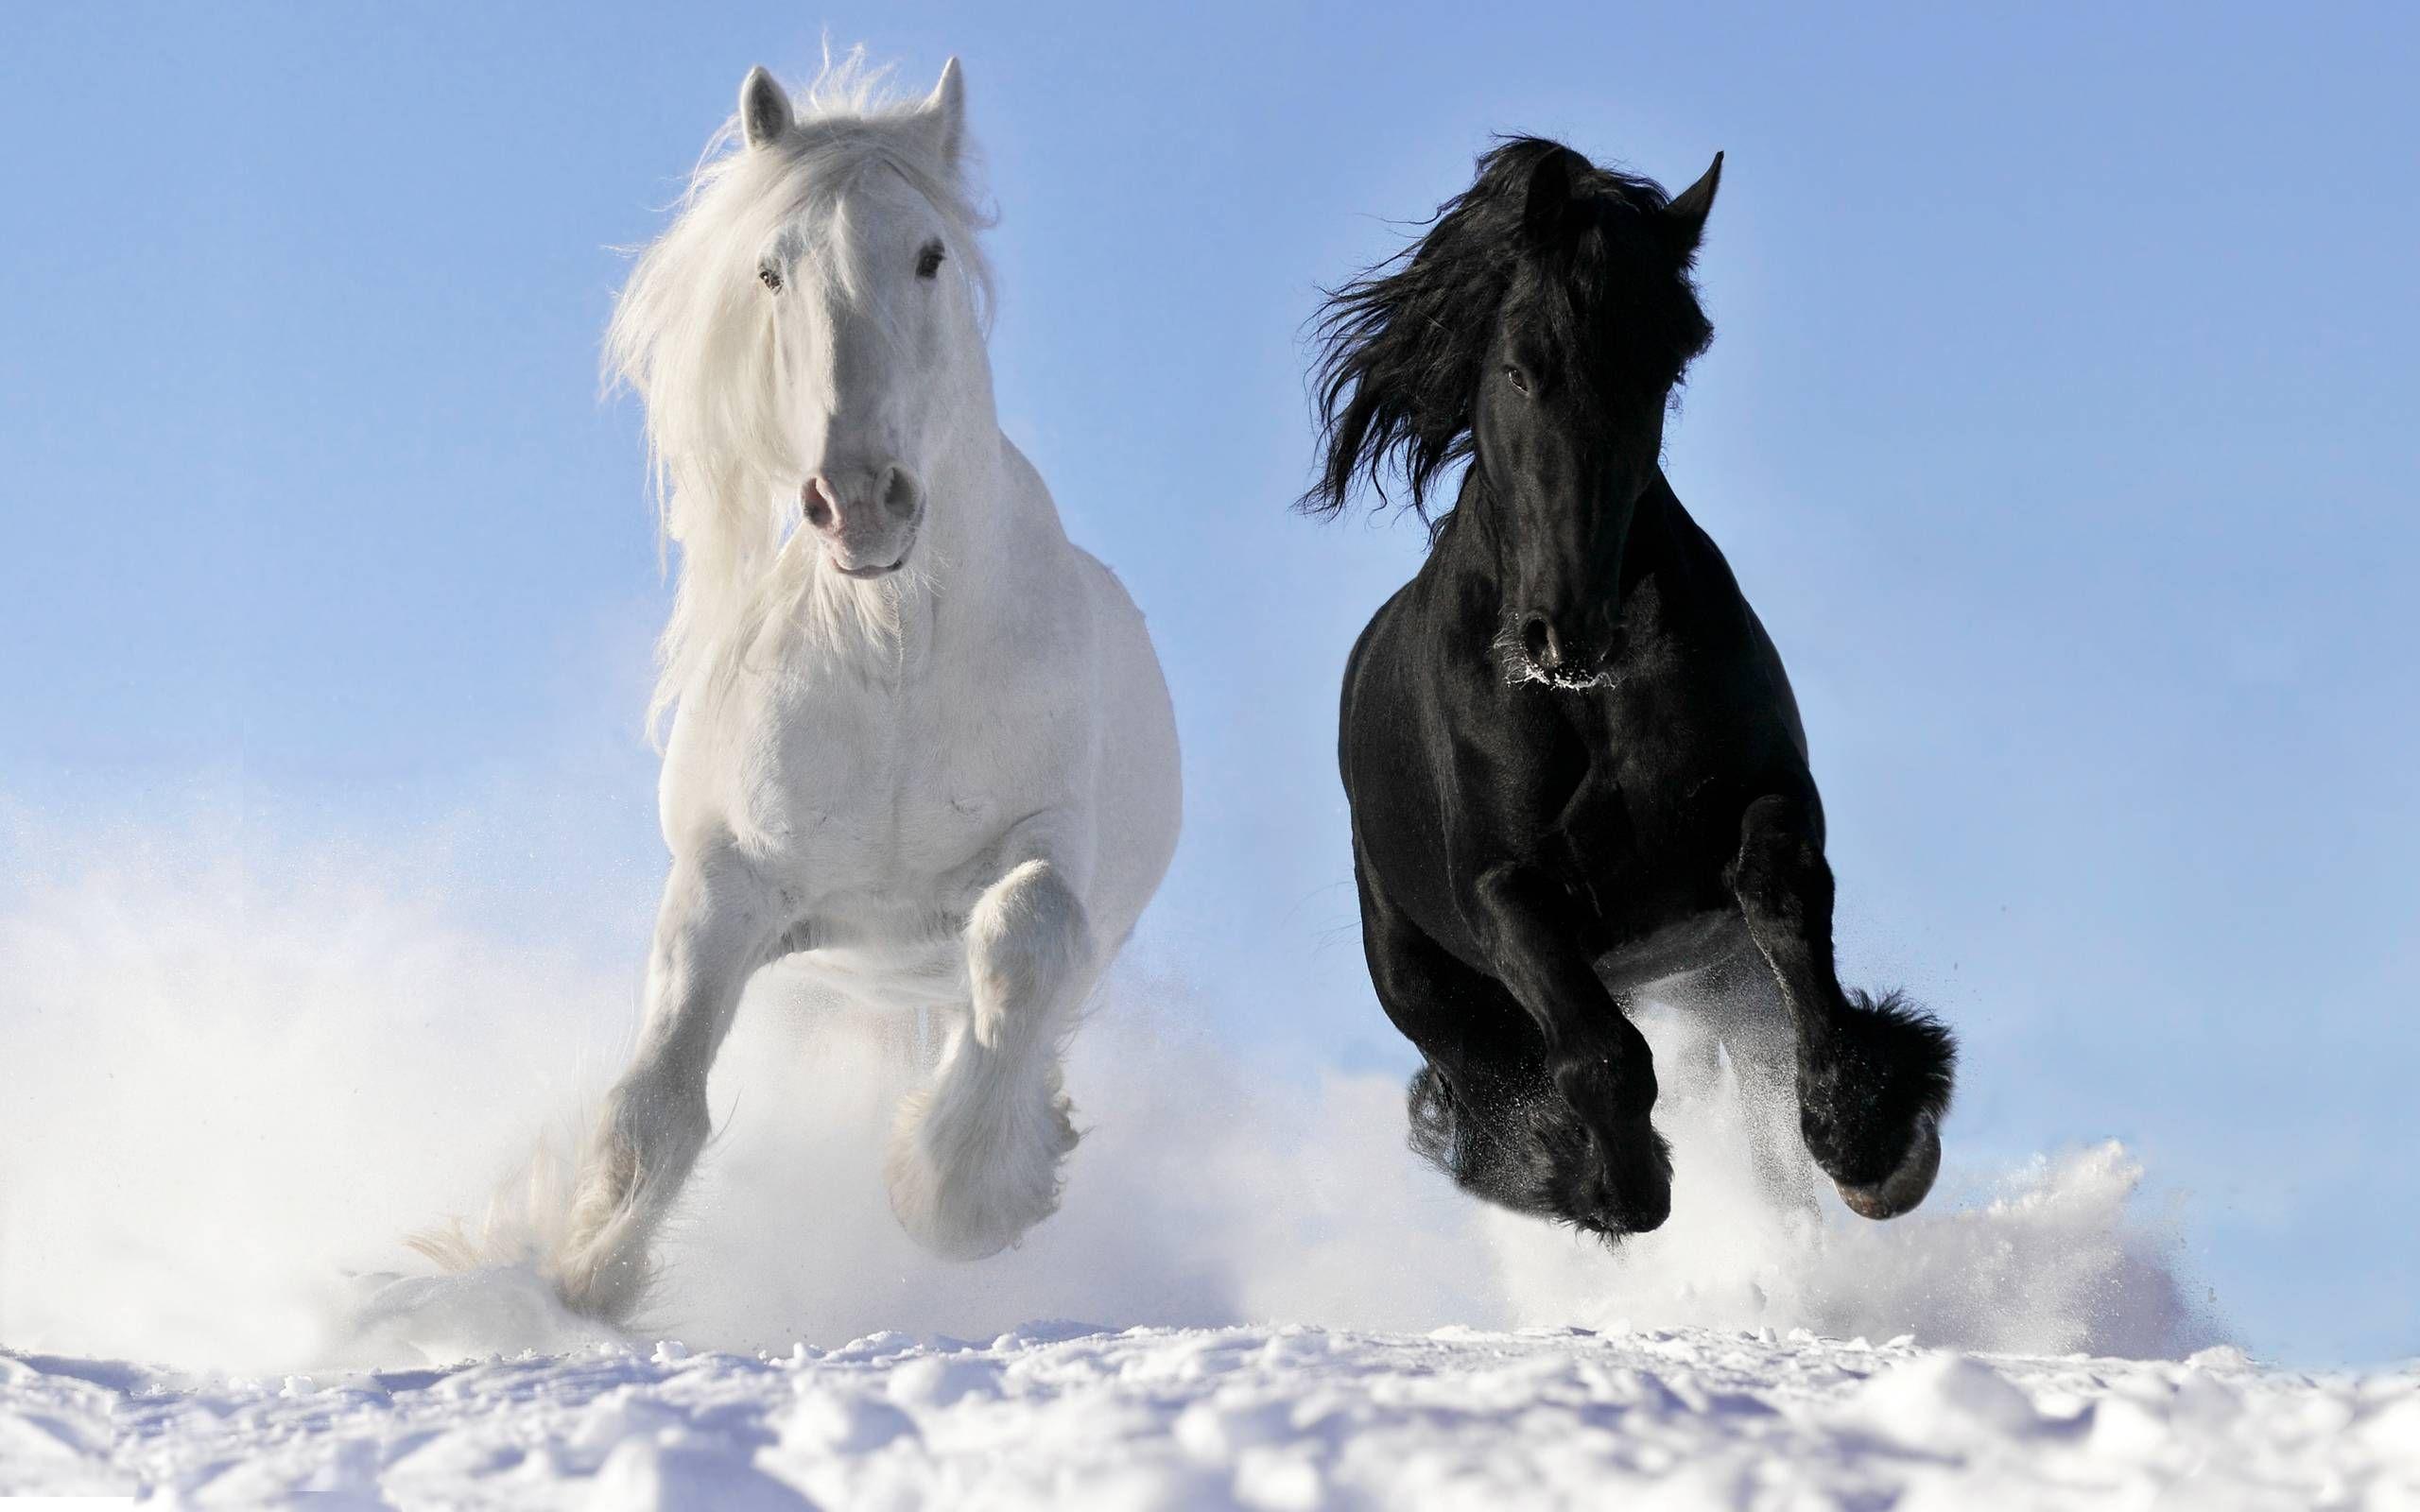 Horse Wallpaper Black And White Desktop Wallpapers Top Wallpaper